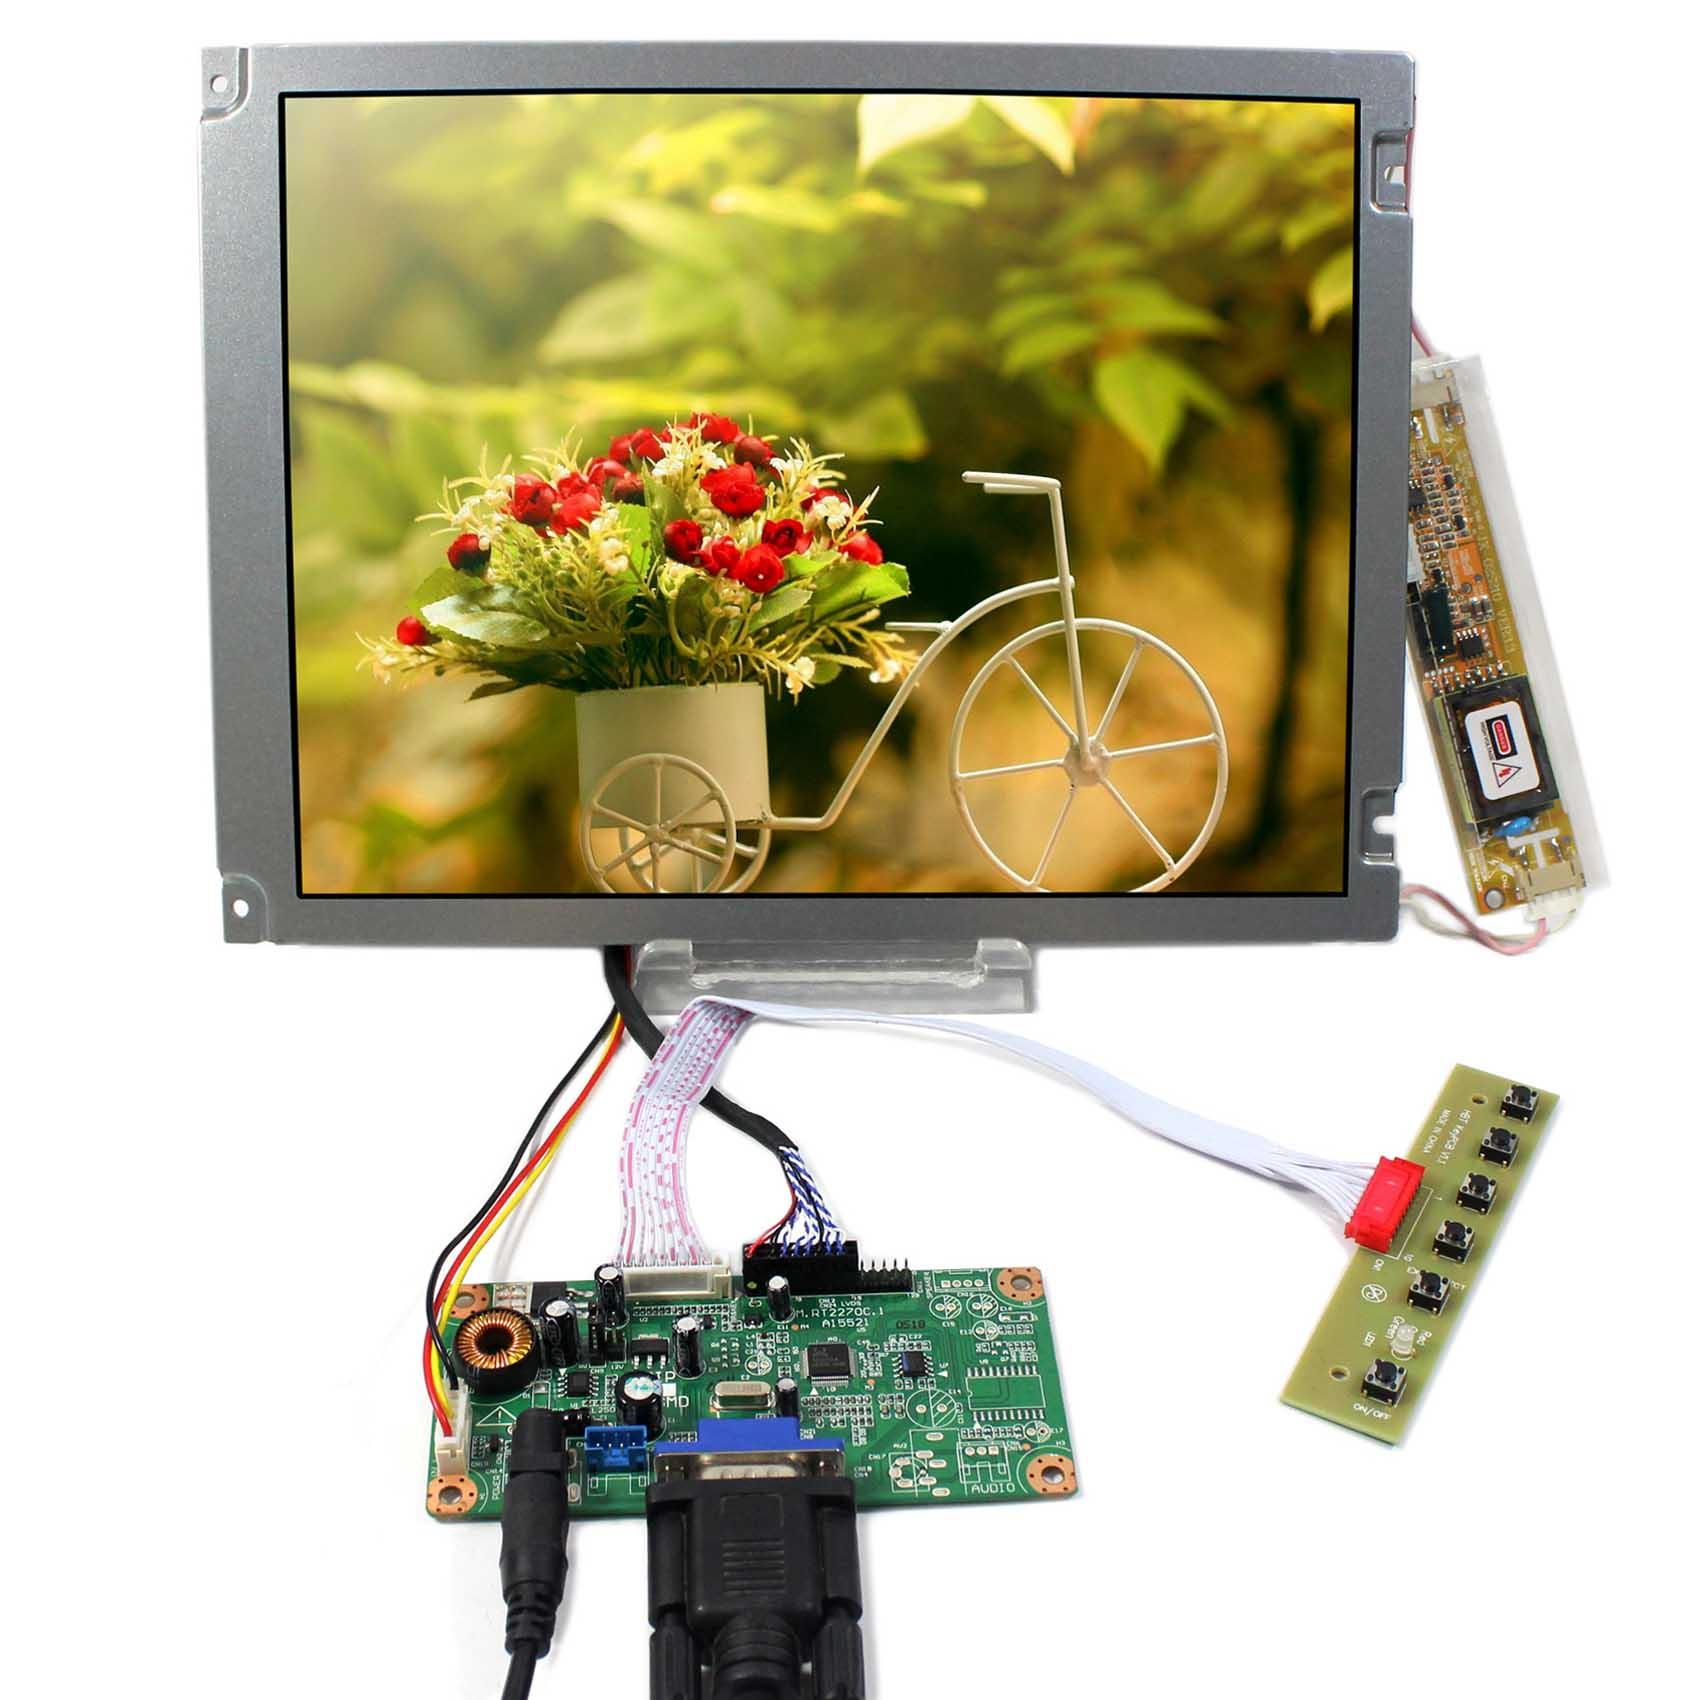 10.4inch AA104SG04 800x600 LCD Screen+VGA LCD Controller Board RT2270C-A10.4inch AA104SG04 800x600 LCD Screen+VGA LCD Controller Board RT2270C-A